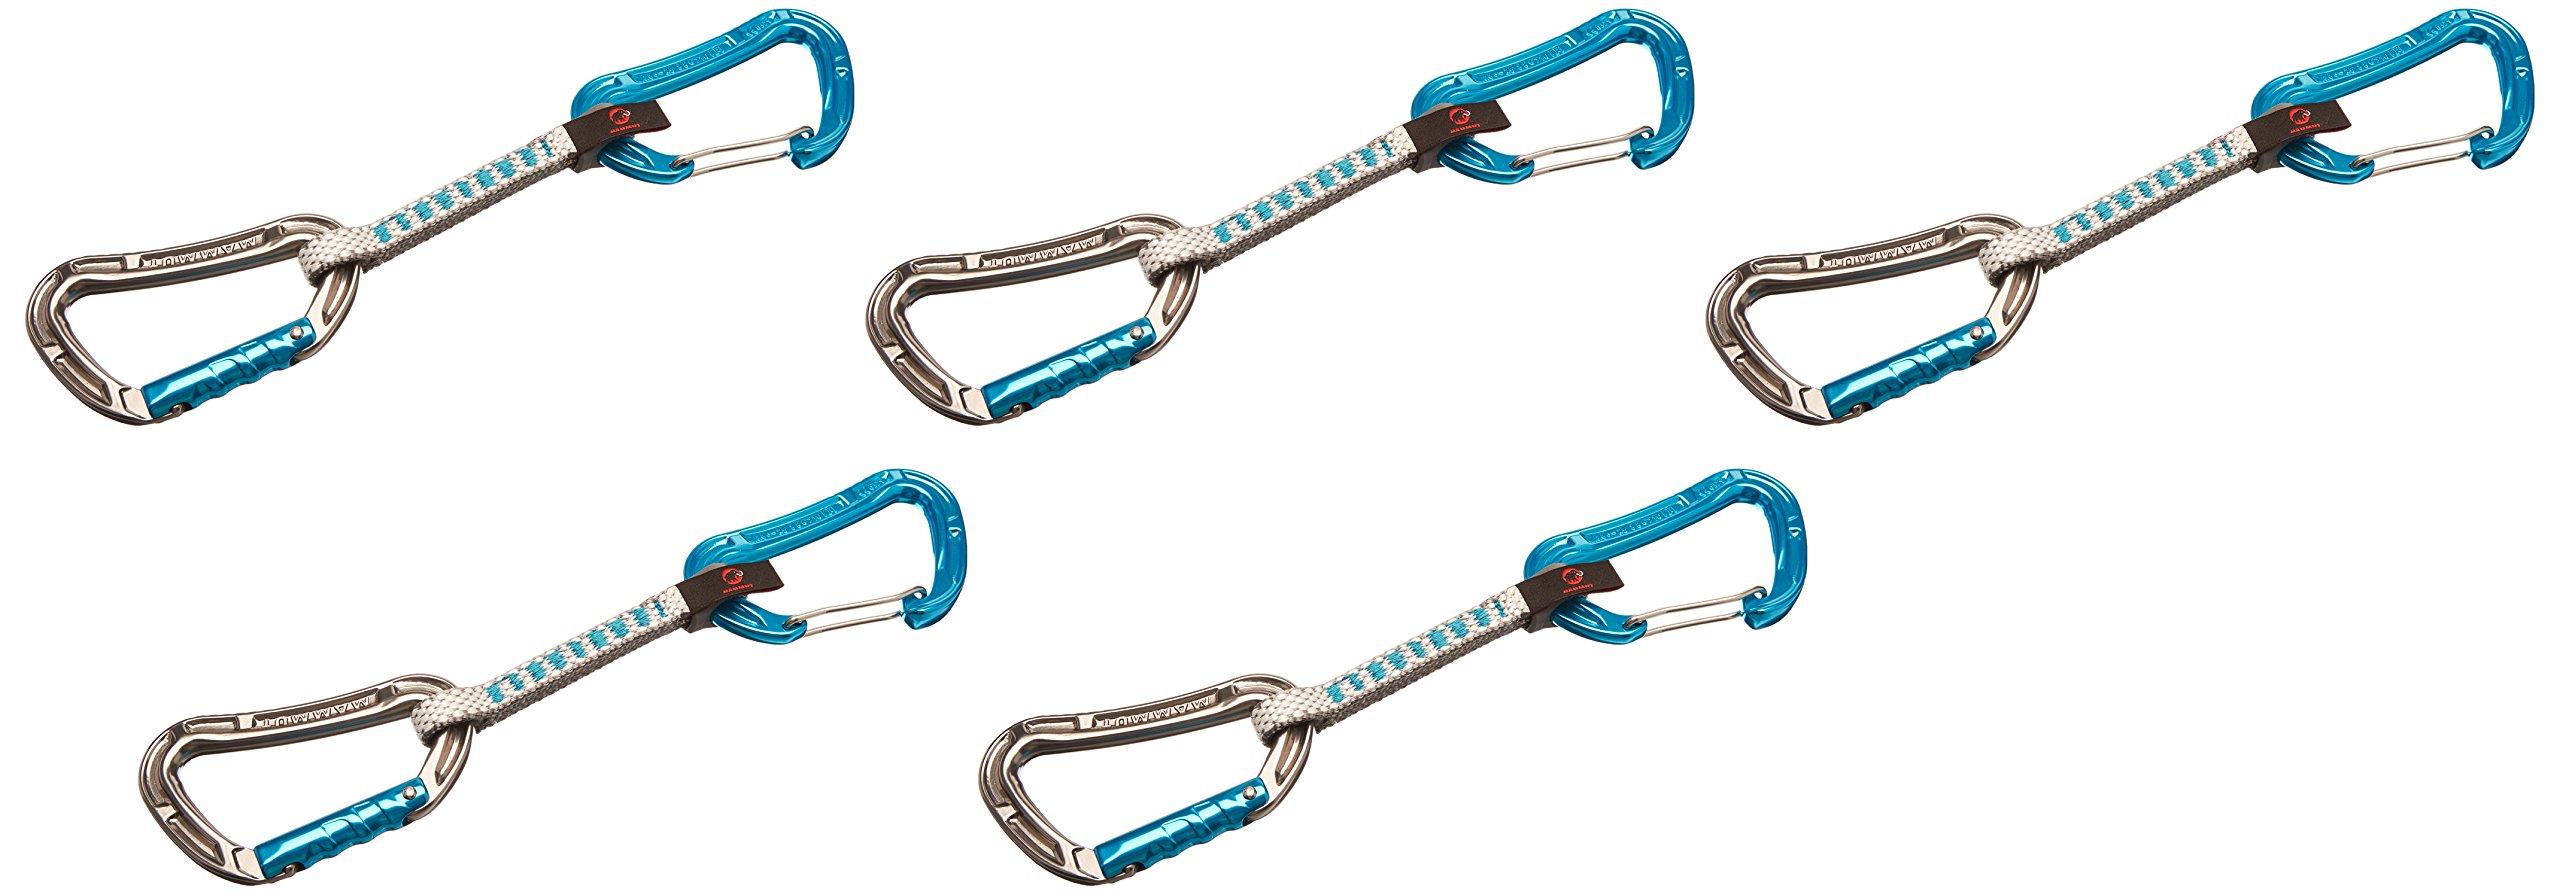 Mammut 5er Pack Bionic Express Sets basalt/aqua Straight Gate/Wire Gate 10 cm